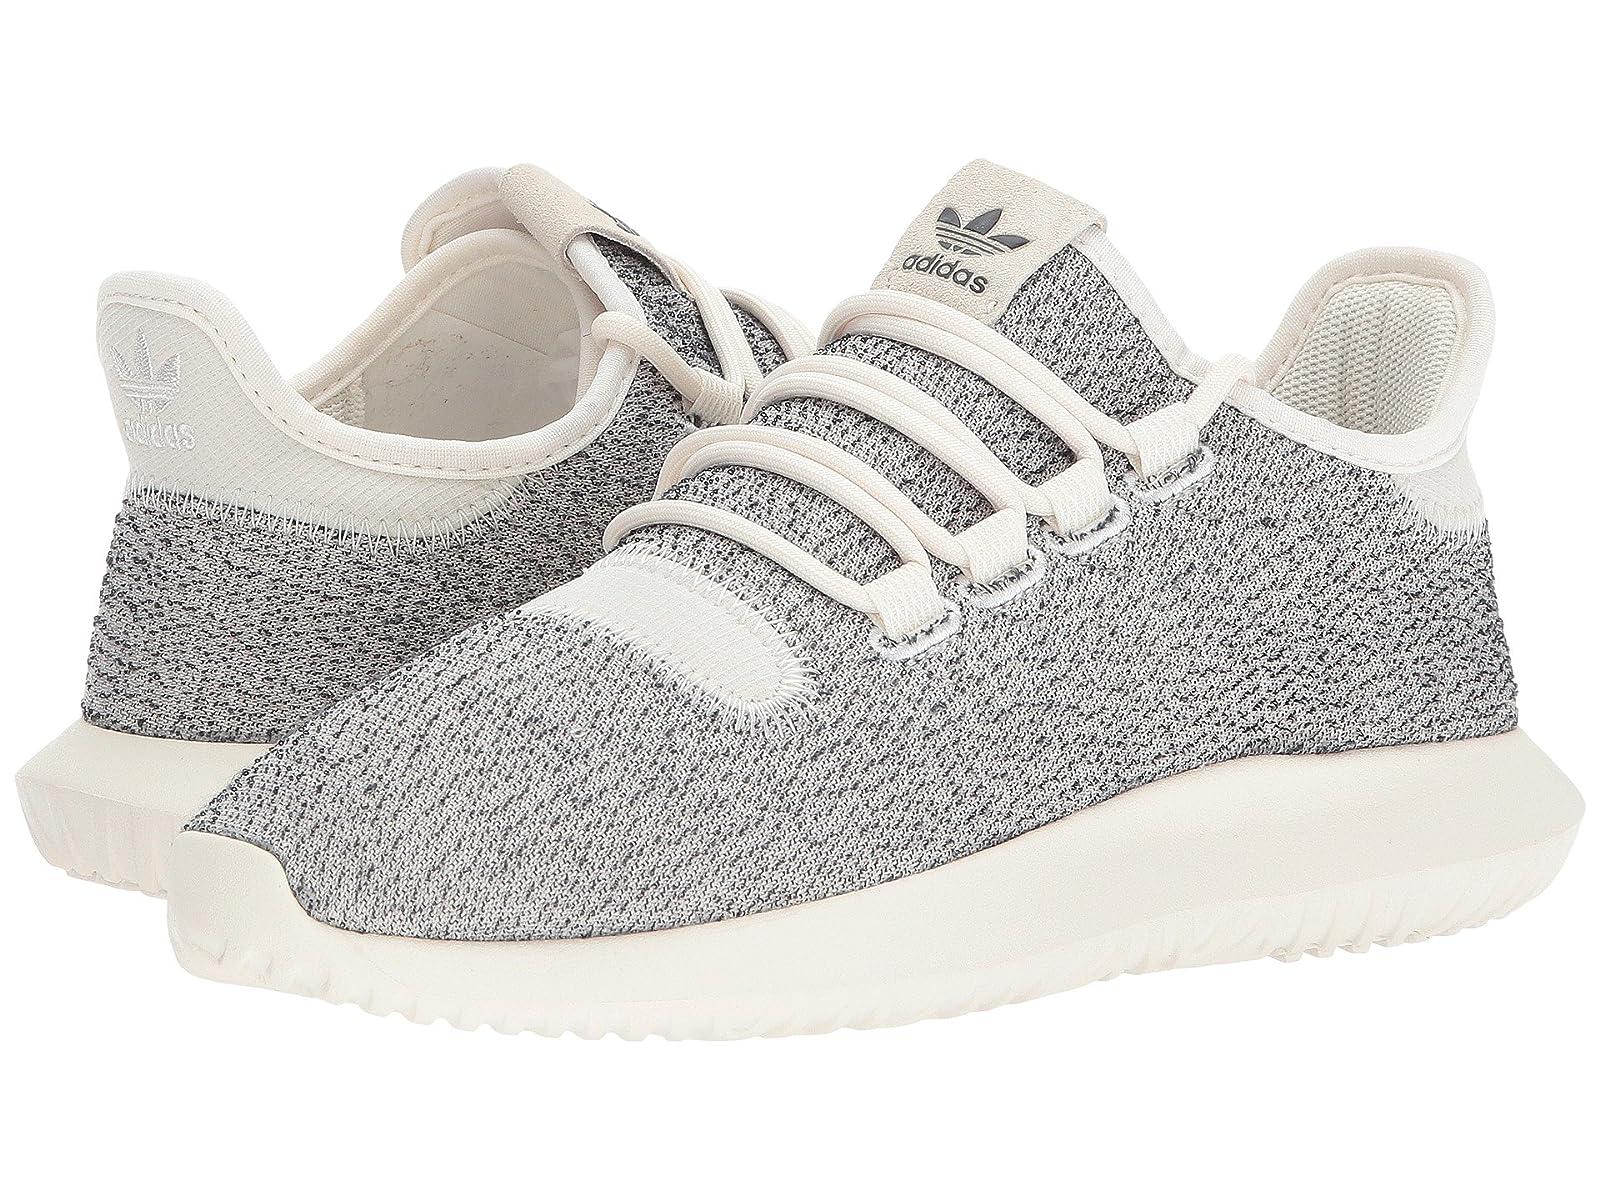 adidas Originals Tubular ShadowStylish and characteristic shoes